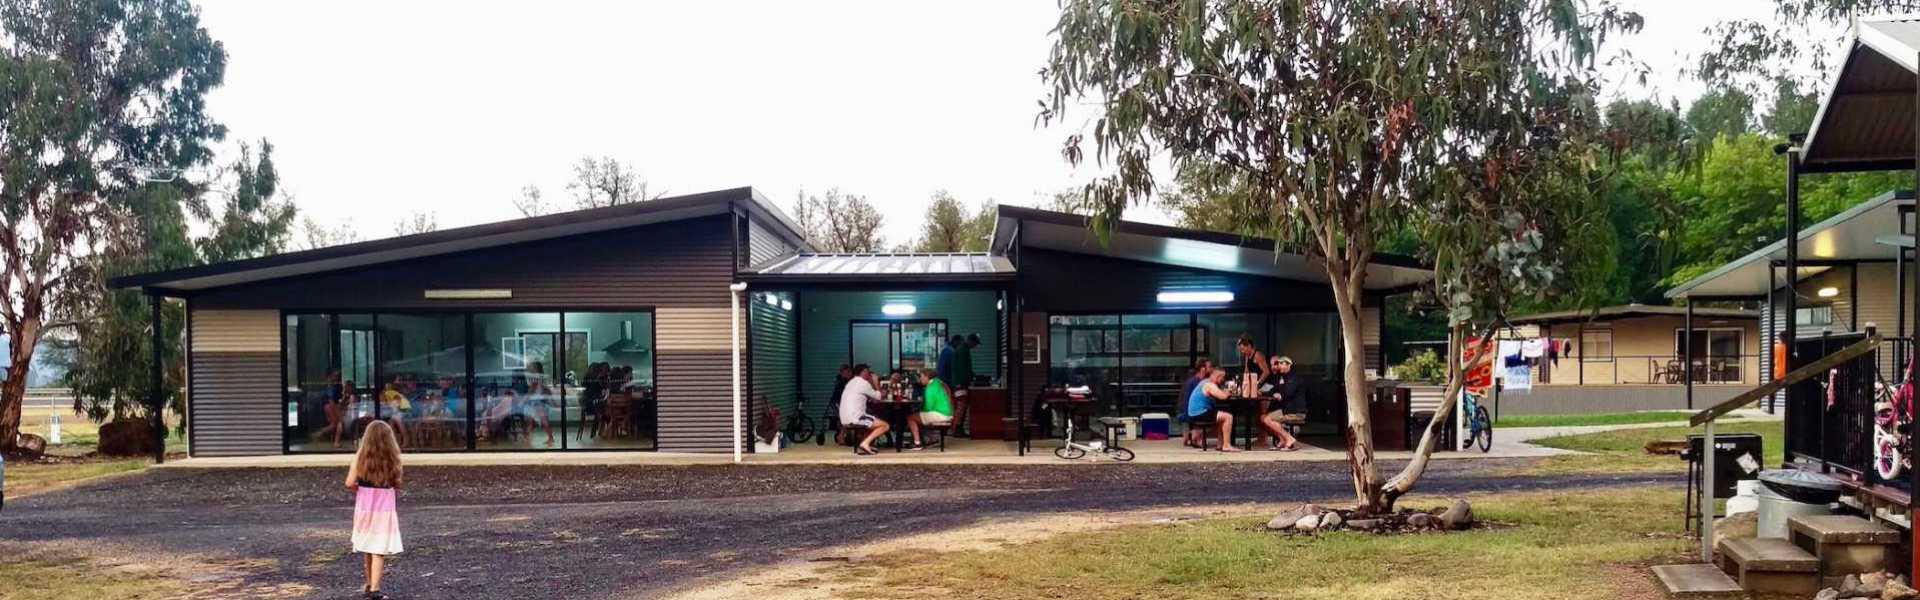 Kui Parks, Khancoban Lakeside Caravan Park, Camp Kitchen